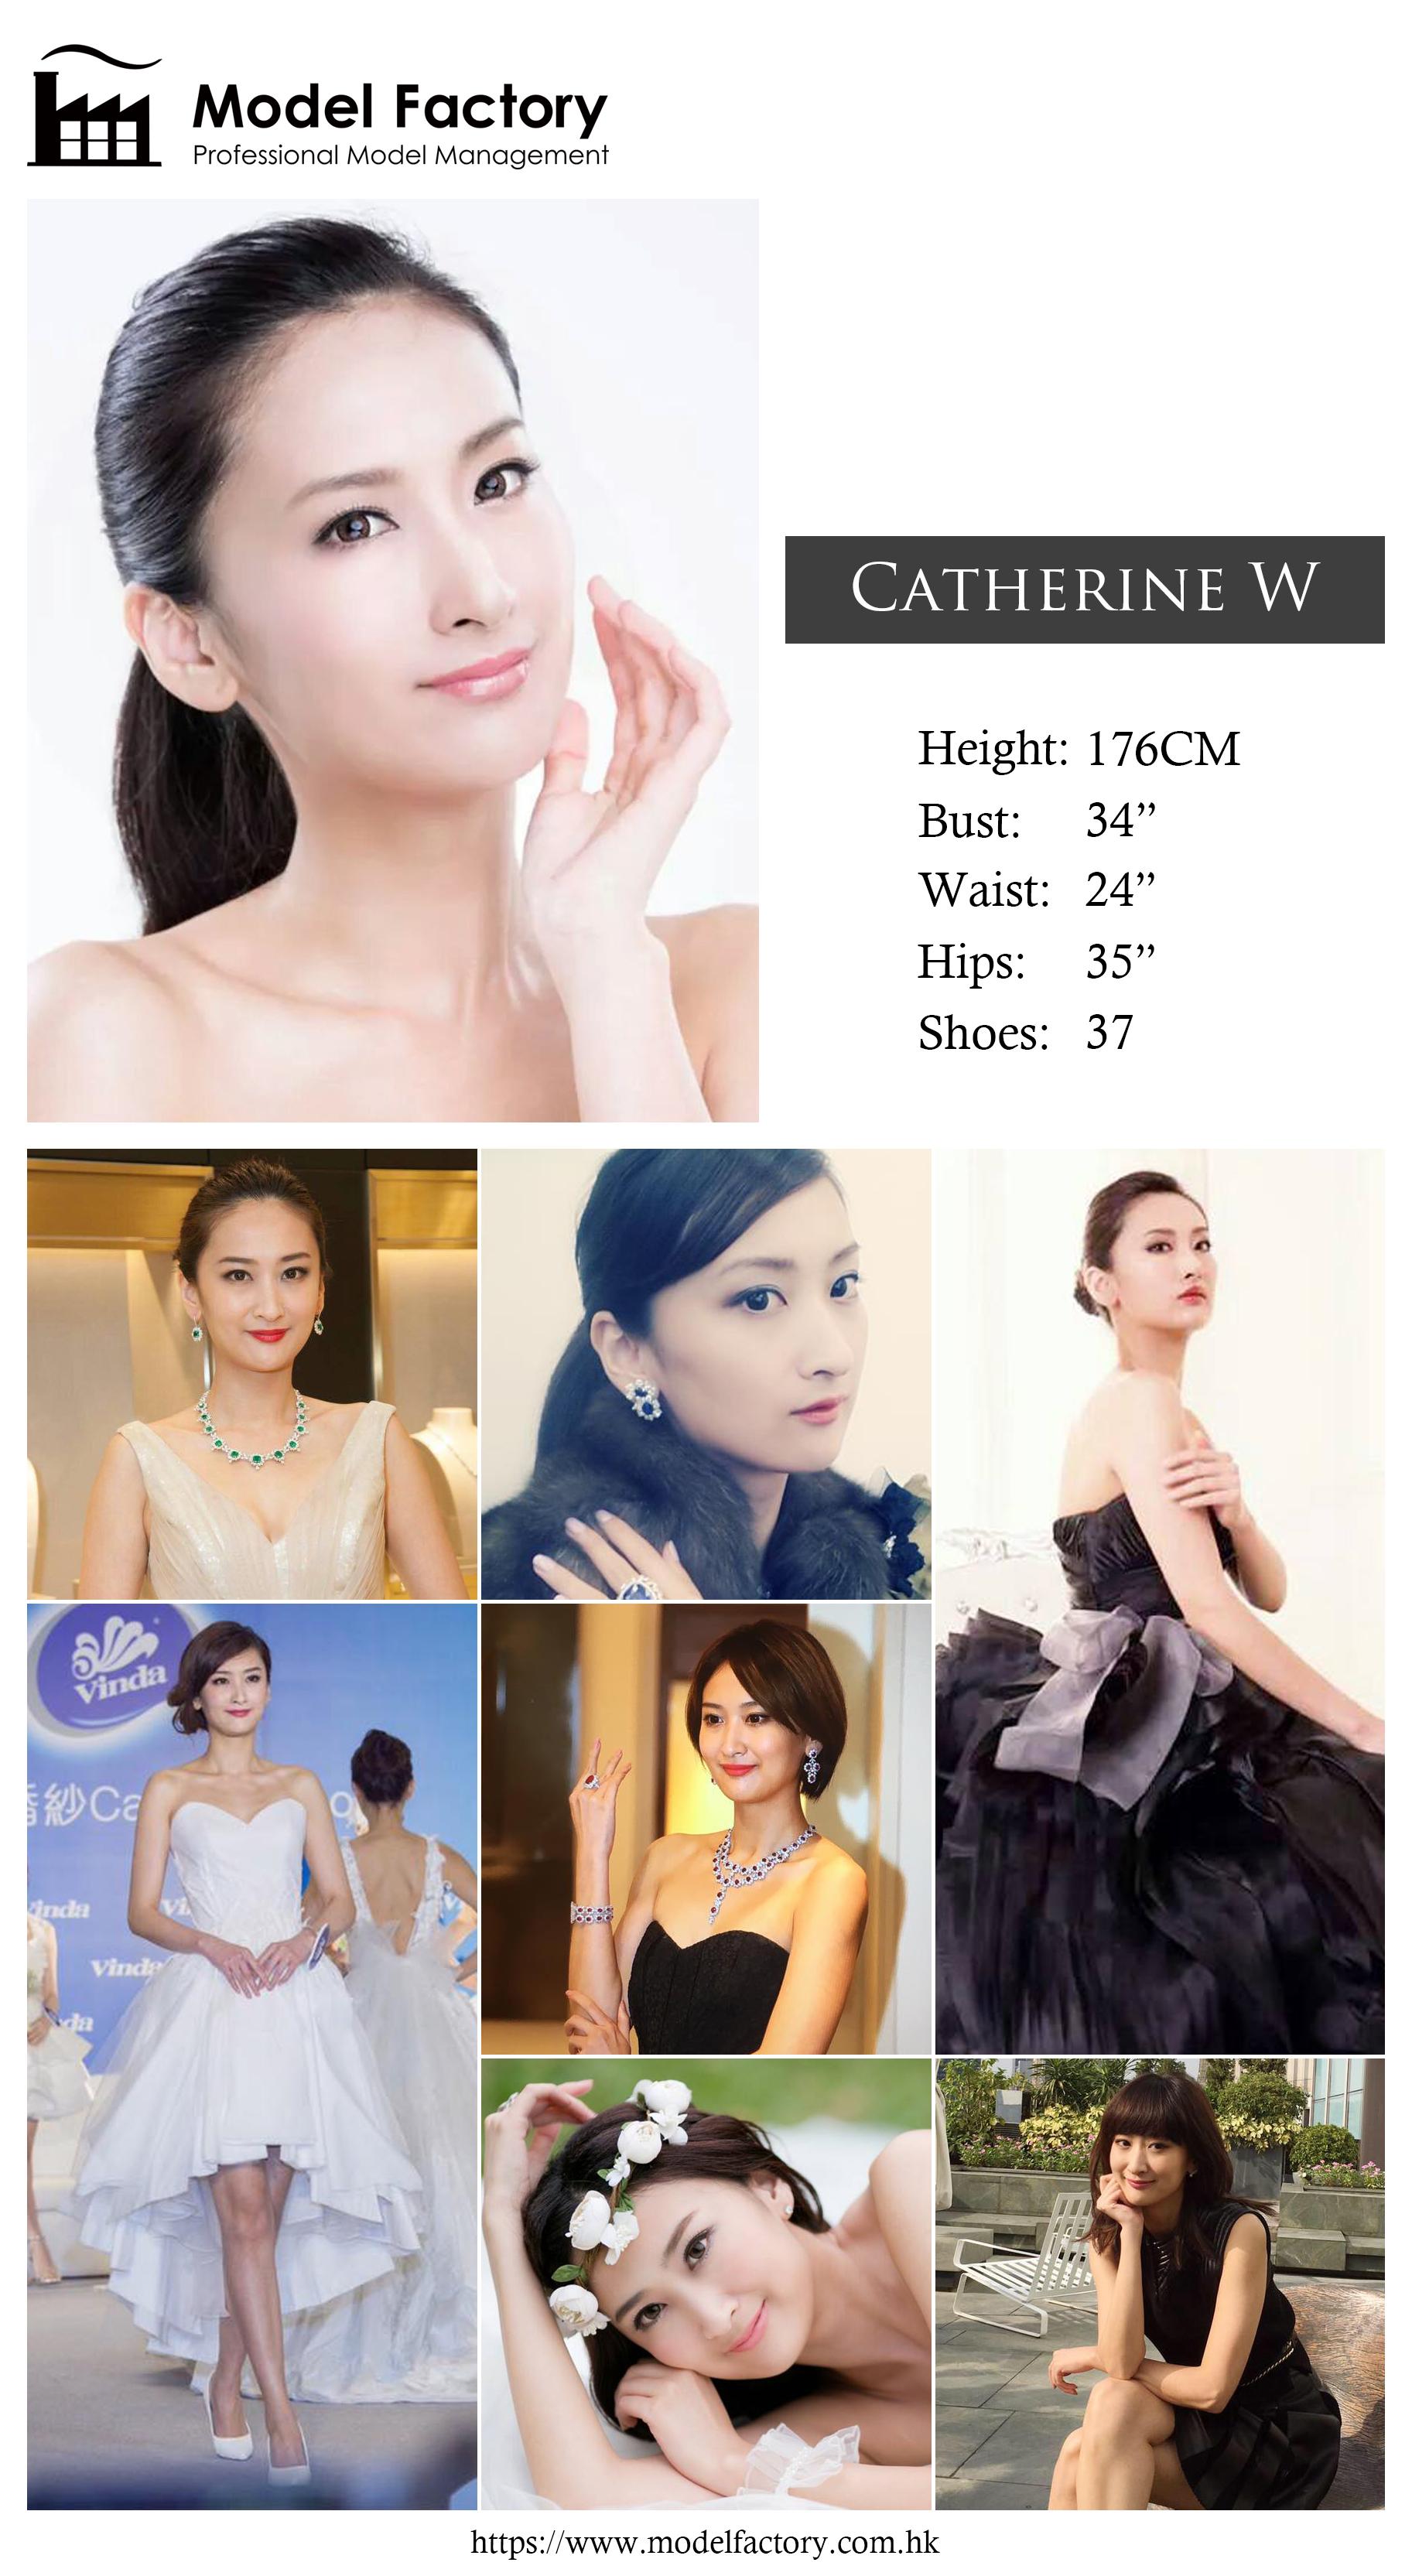 Model Factory Hong Kong Female Model CatherineW